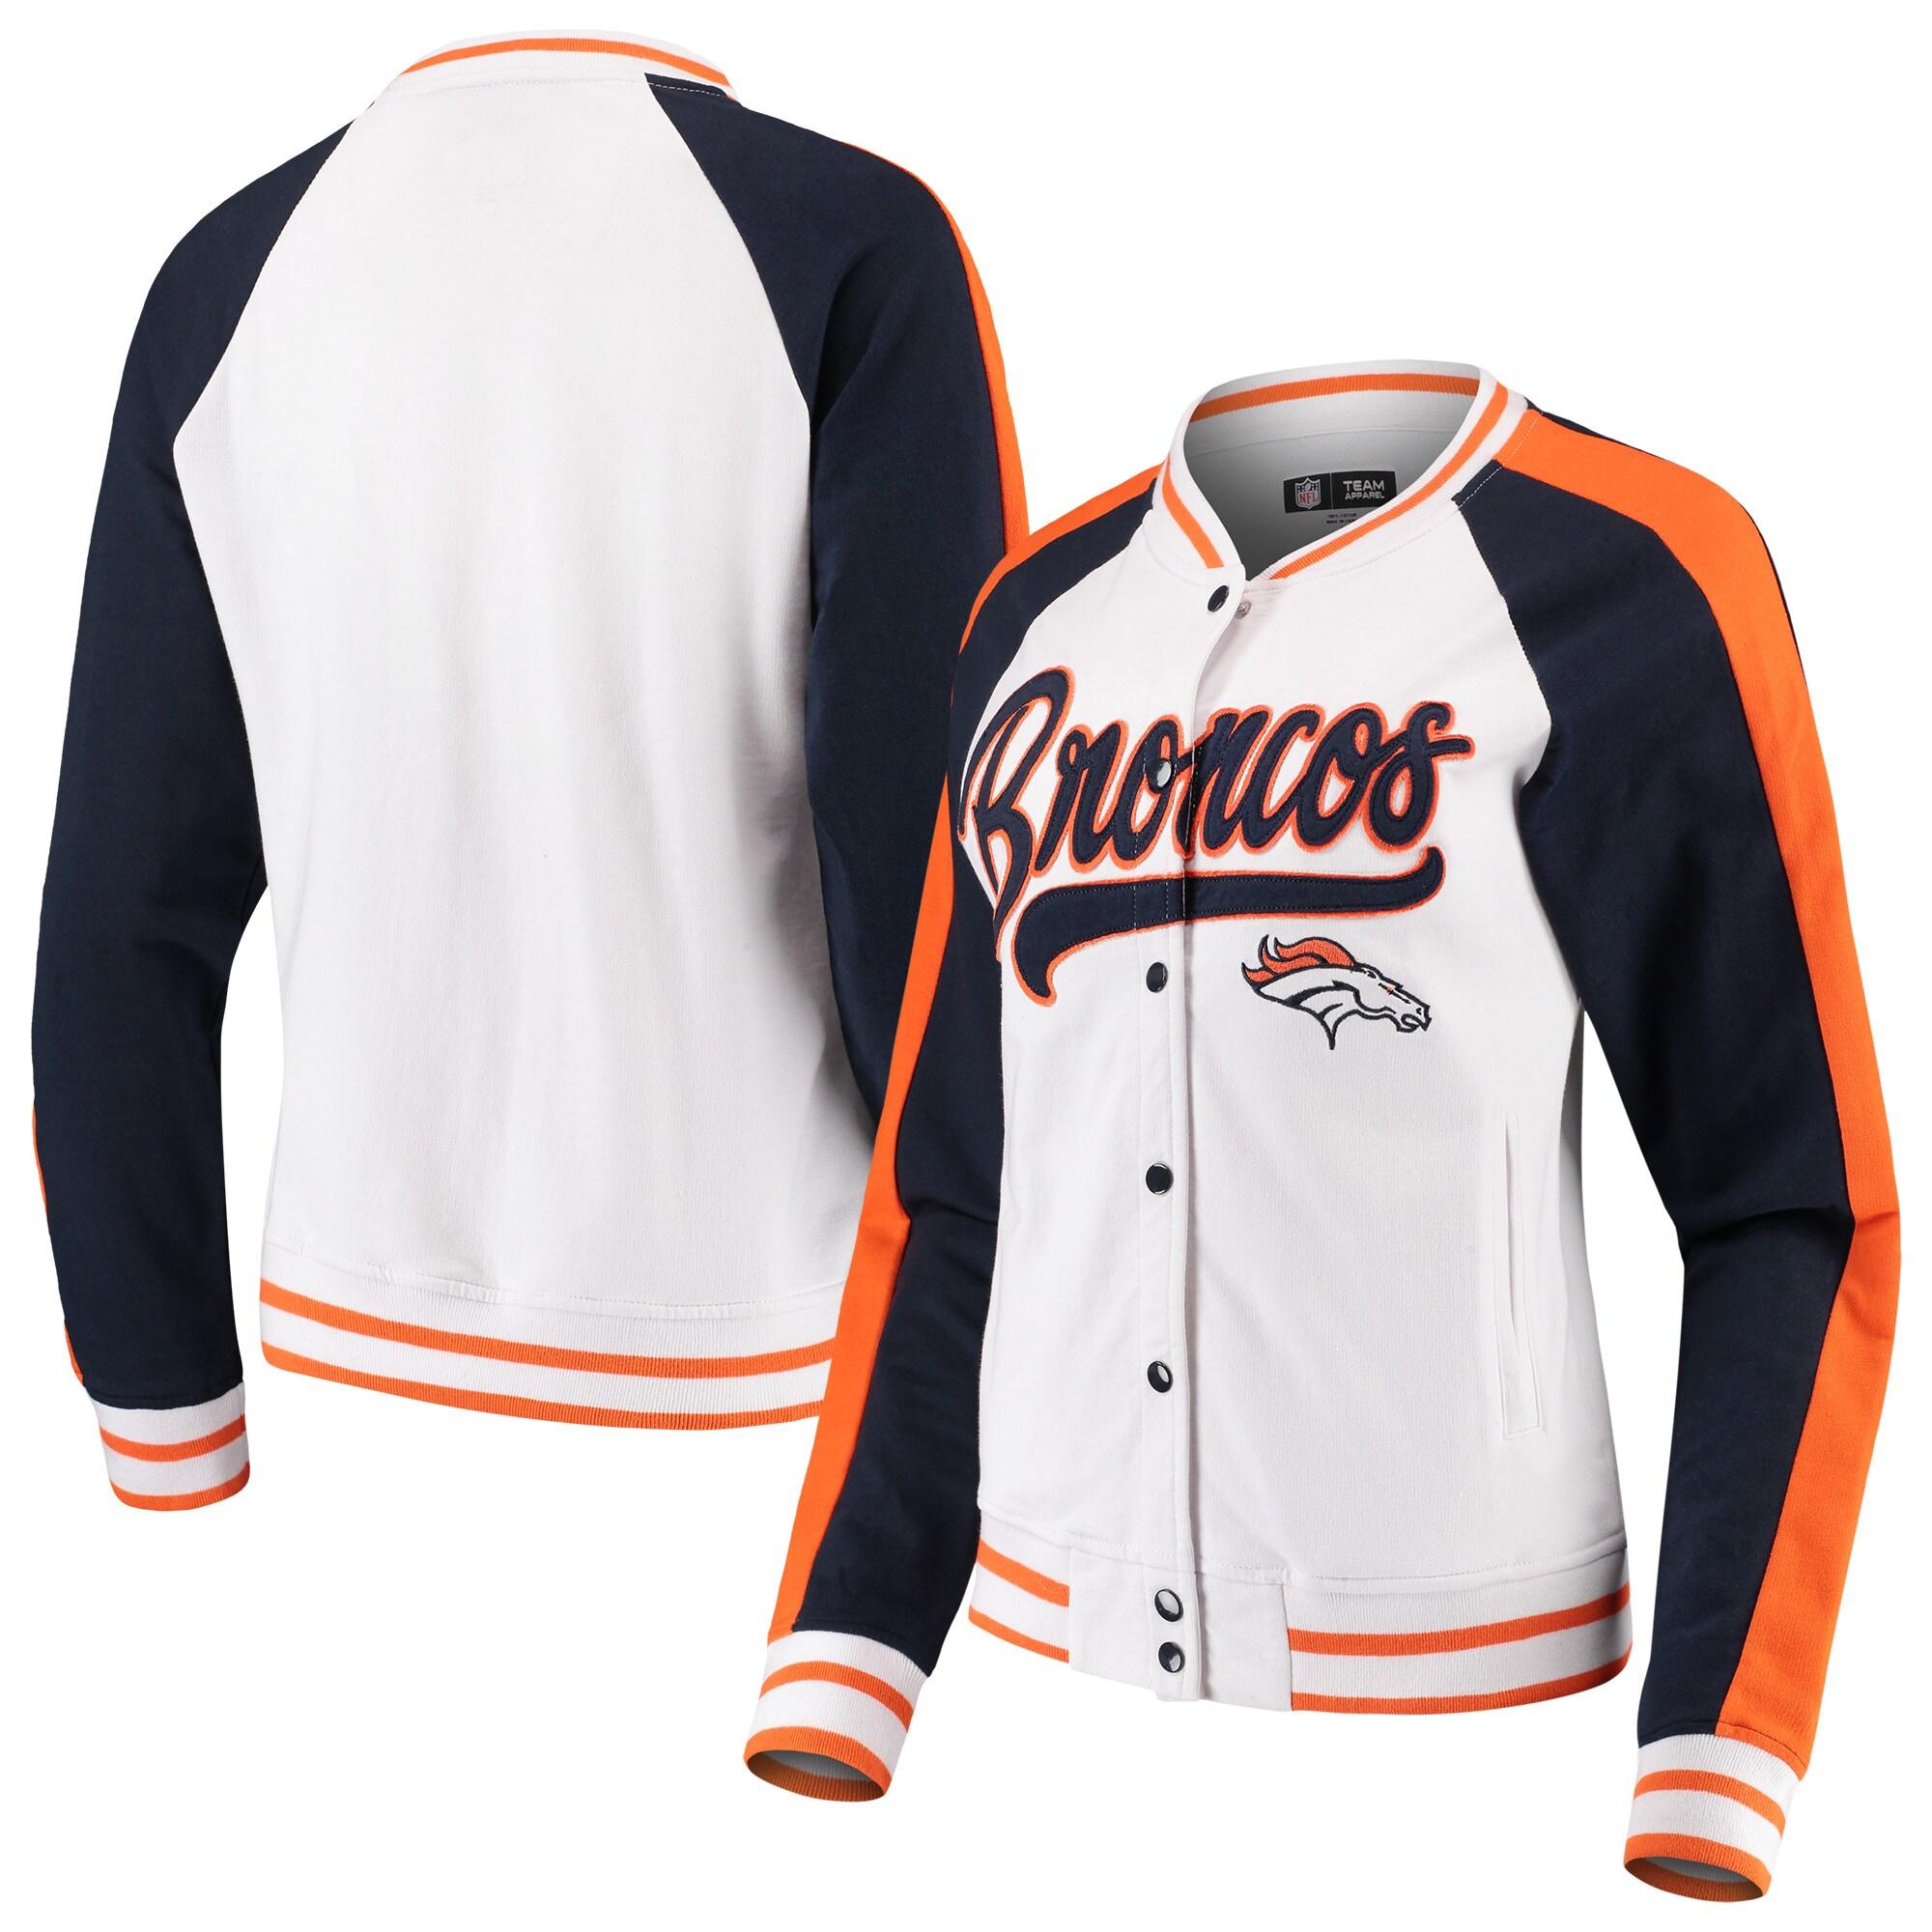 Denver Broncos New Era Women's Varsity Full Snap Jacket - White/Navy